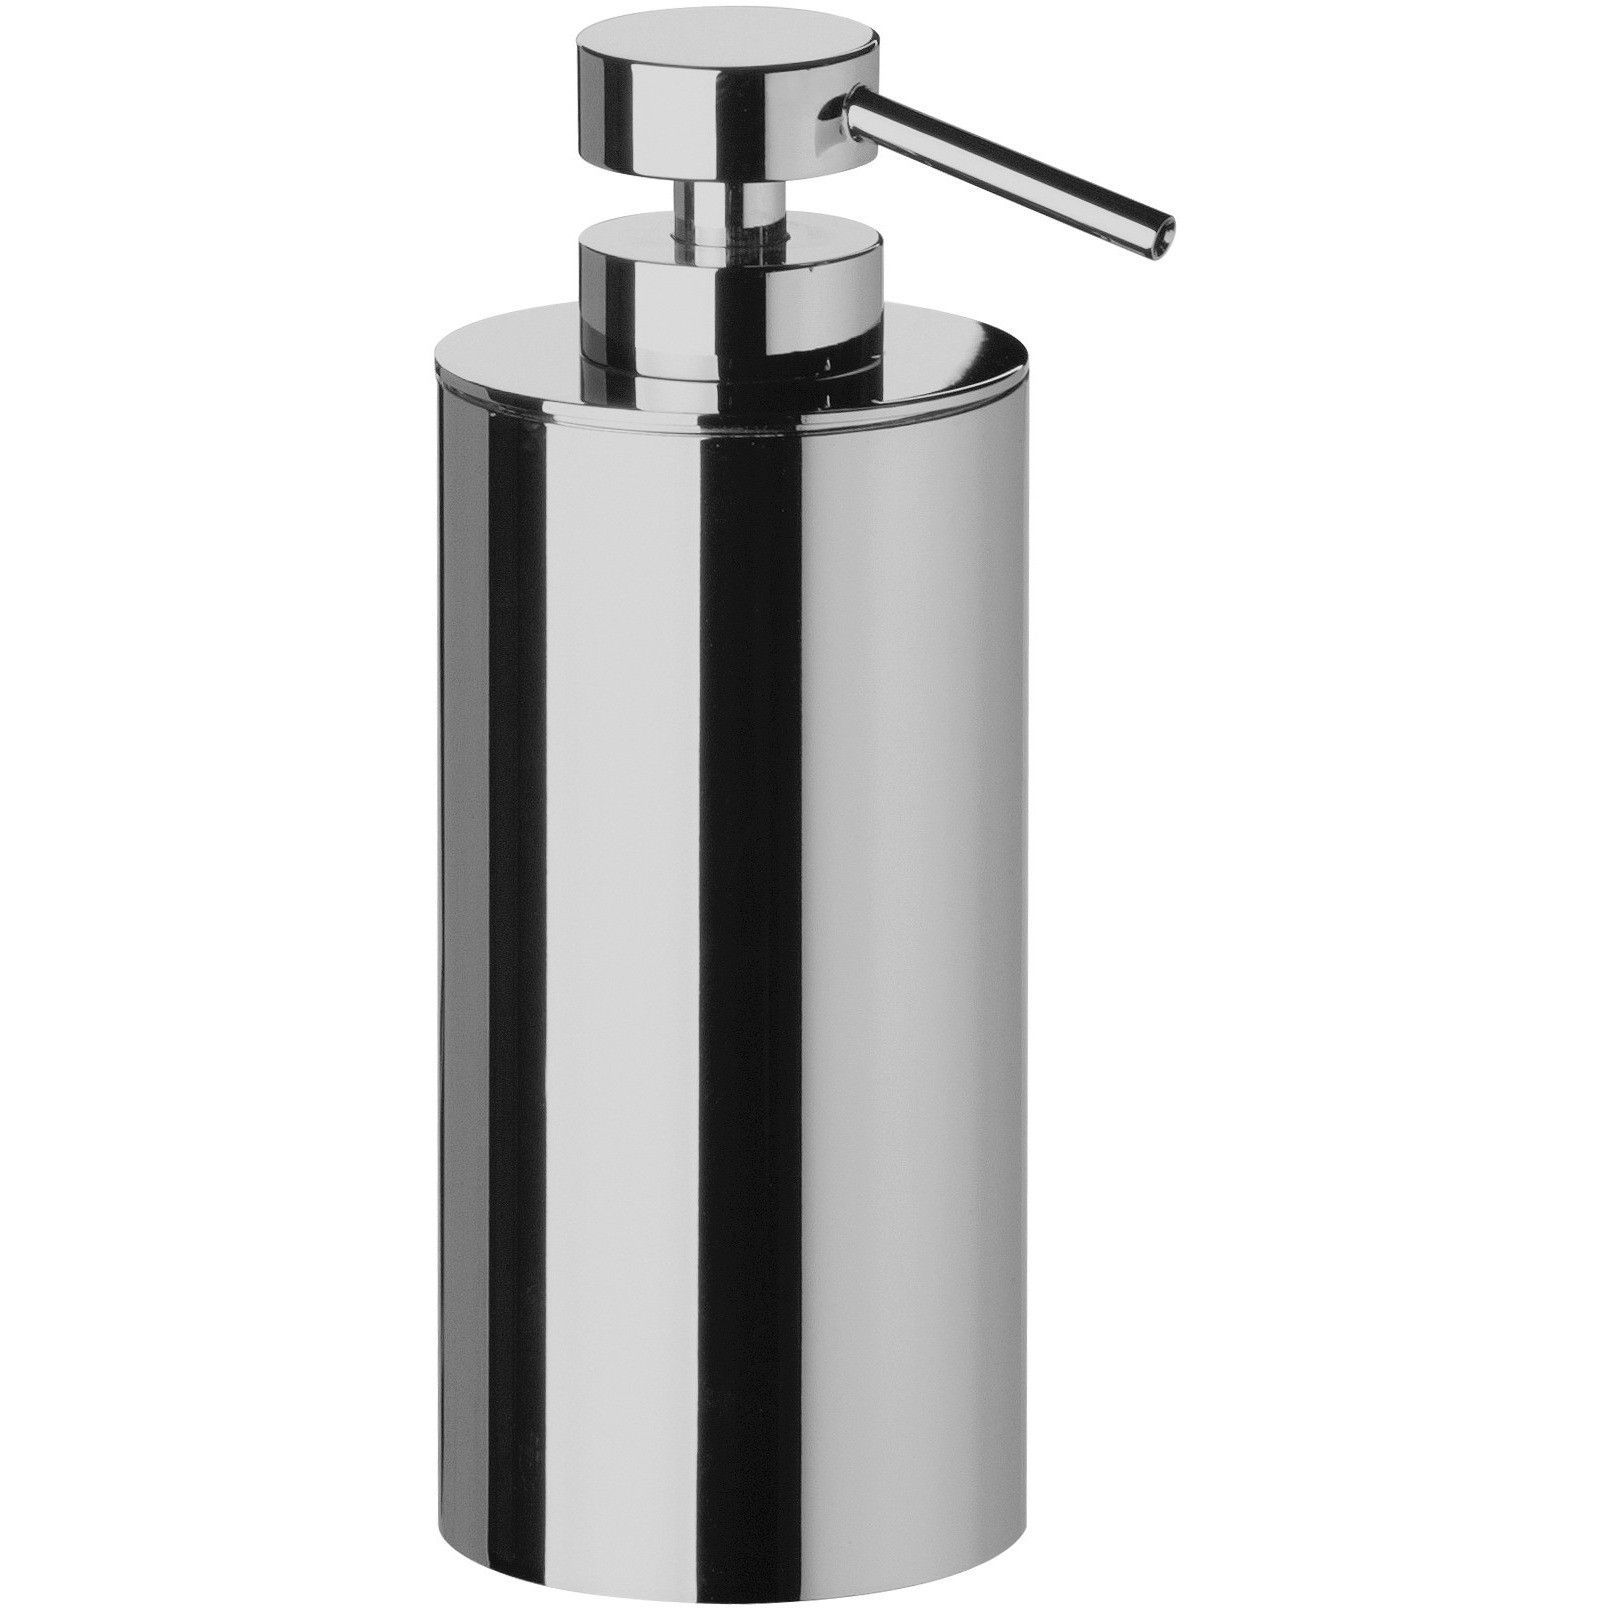 Lisa Pump Liquid Soap Lotion Dispenser For Bathroom Kitchen